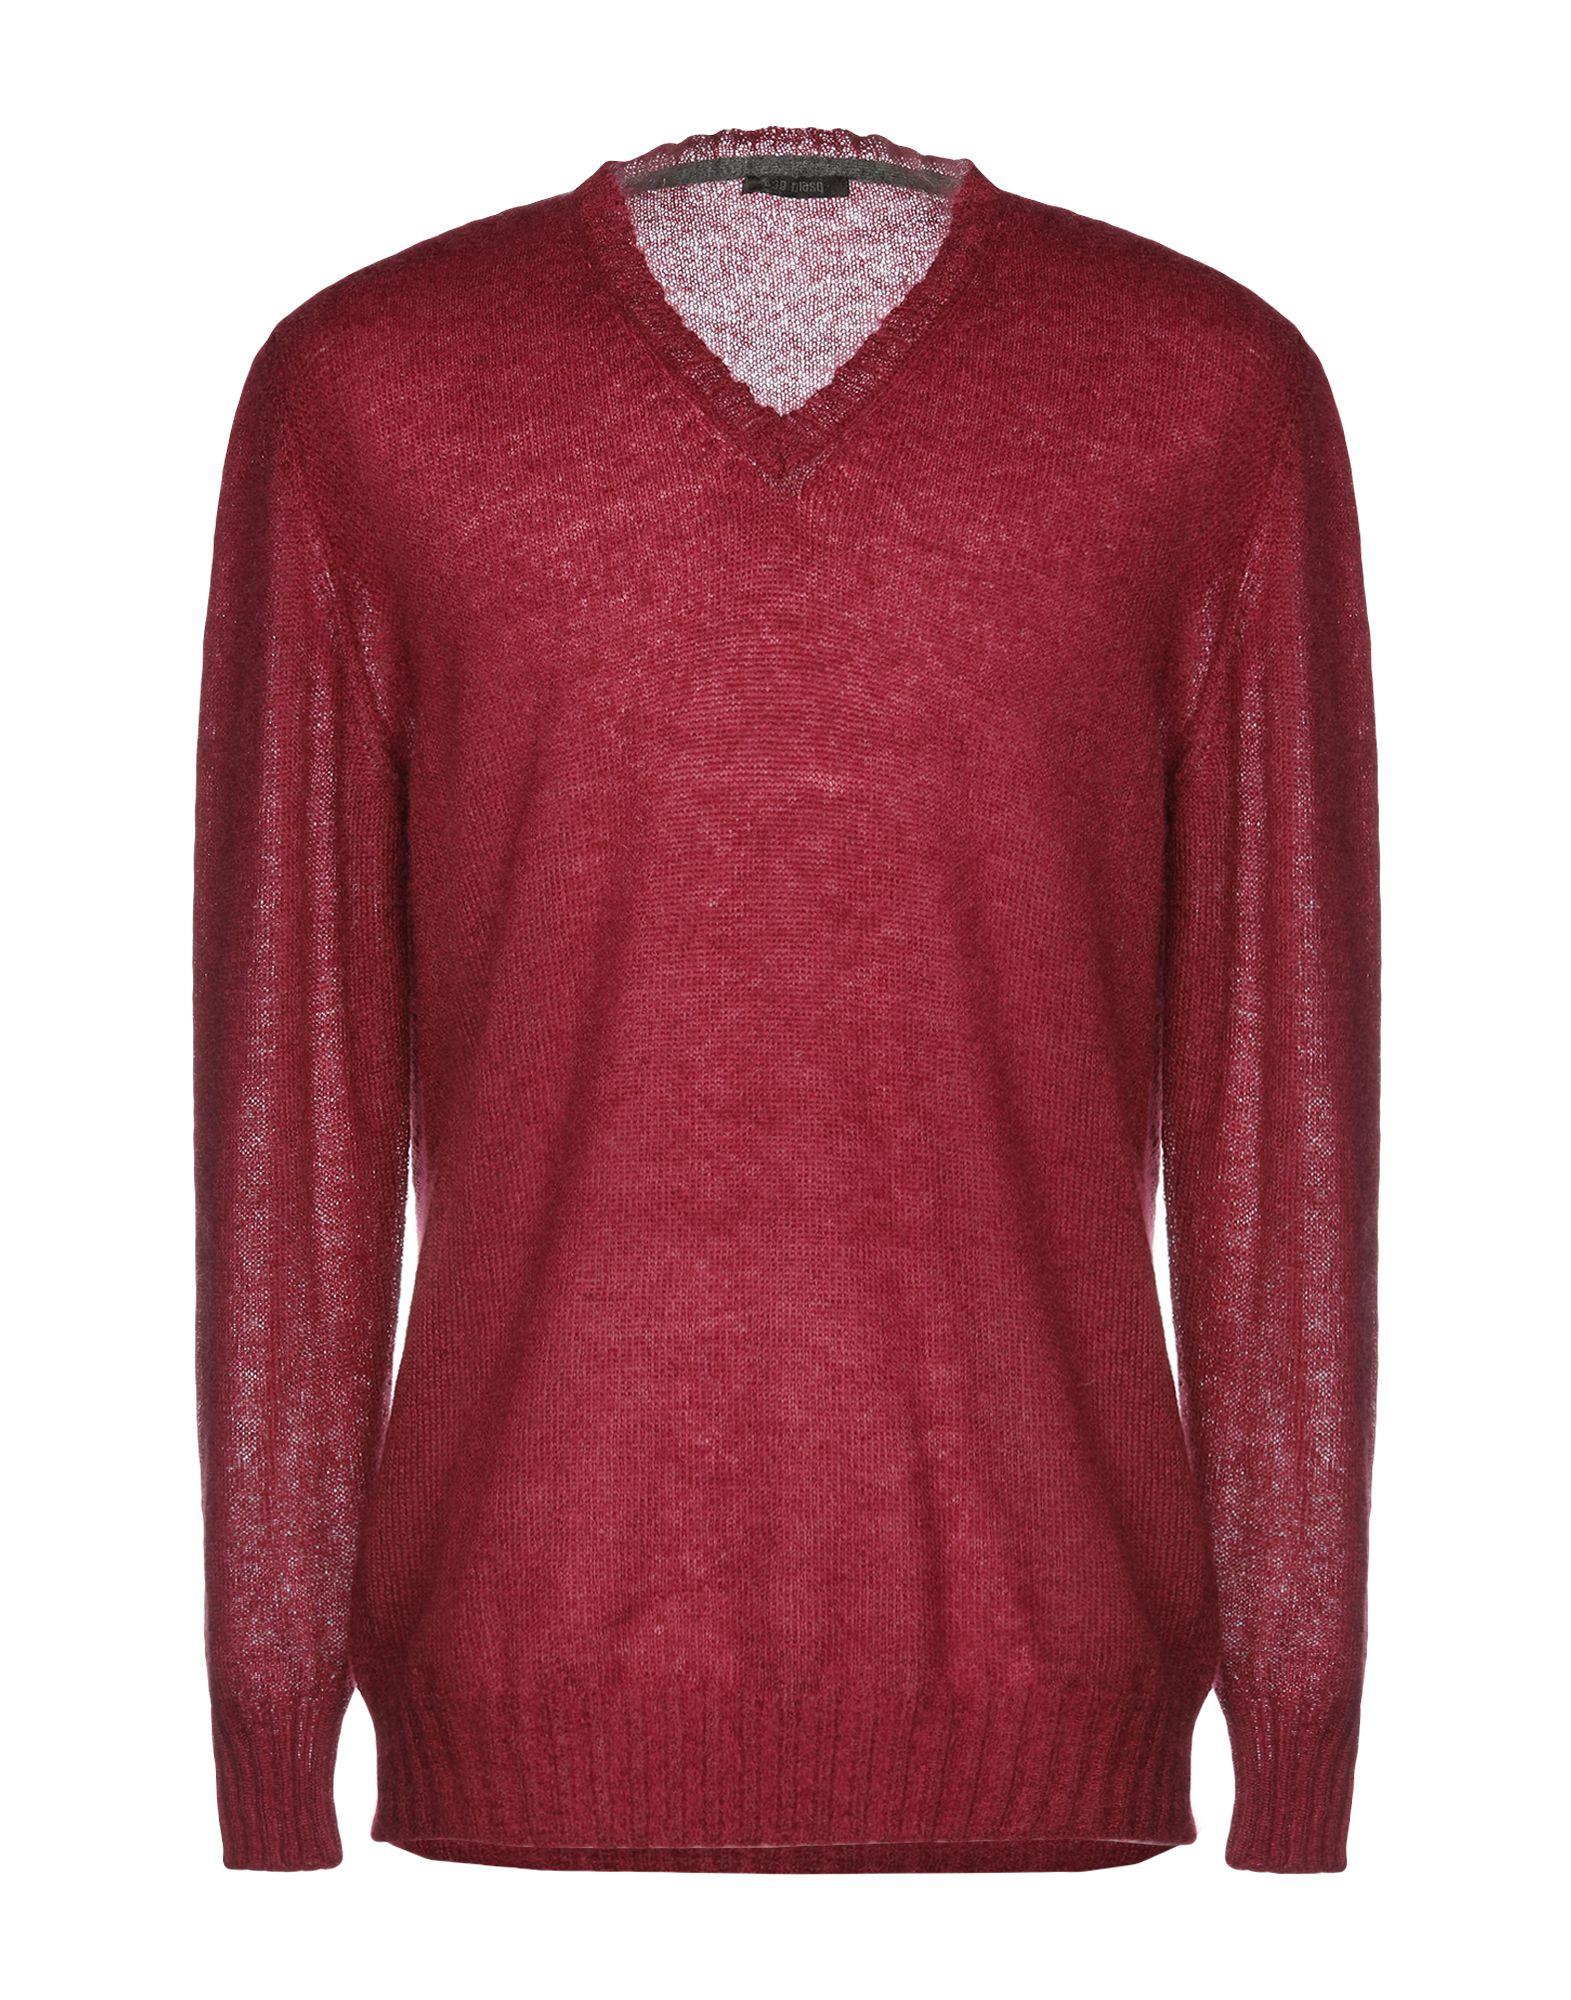 +39 MASQ Свитер 39 masq свитер